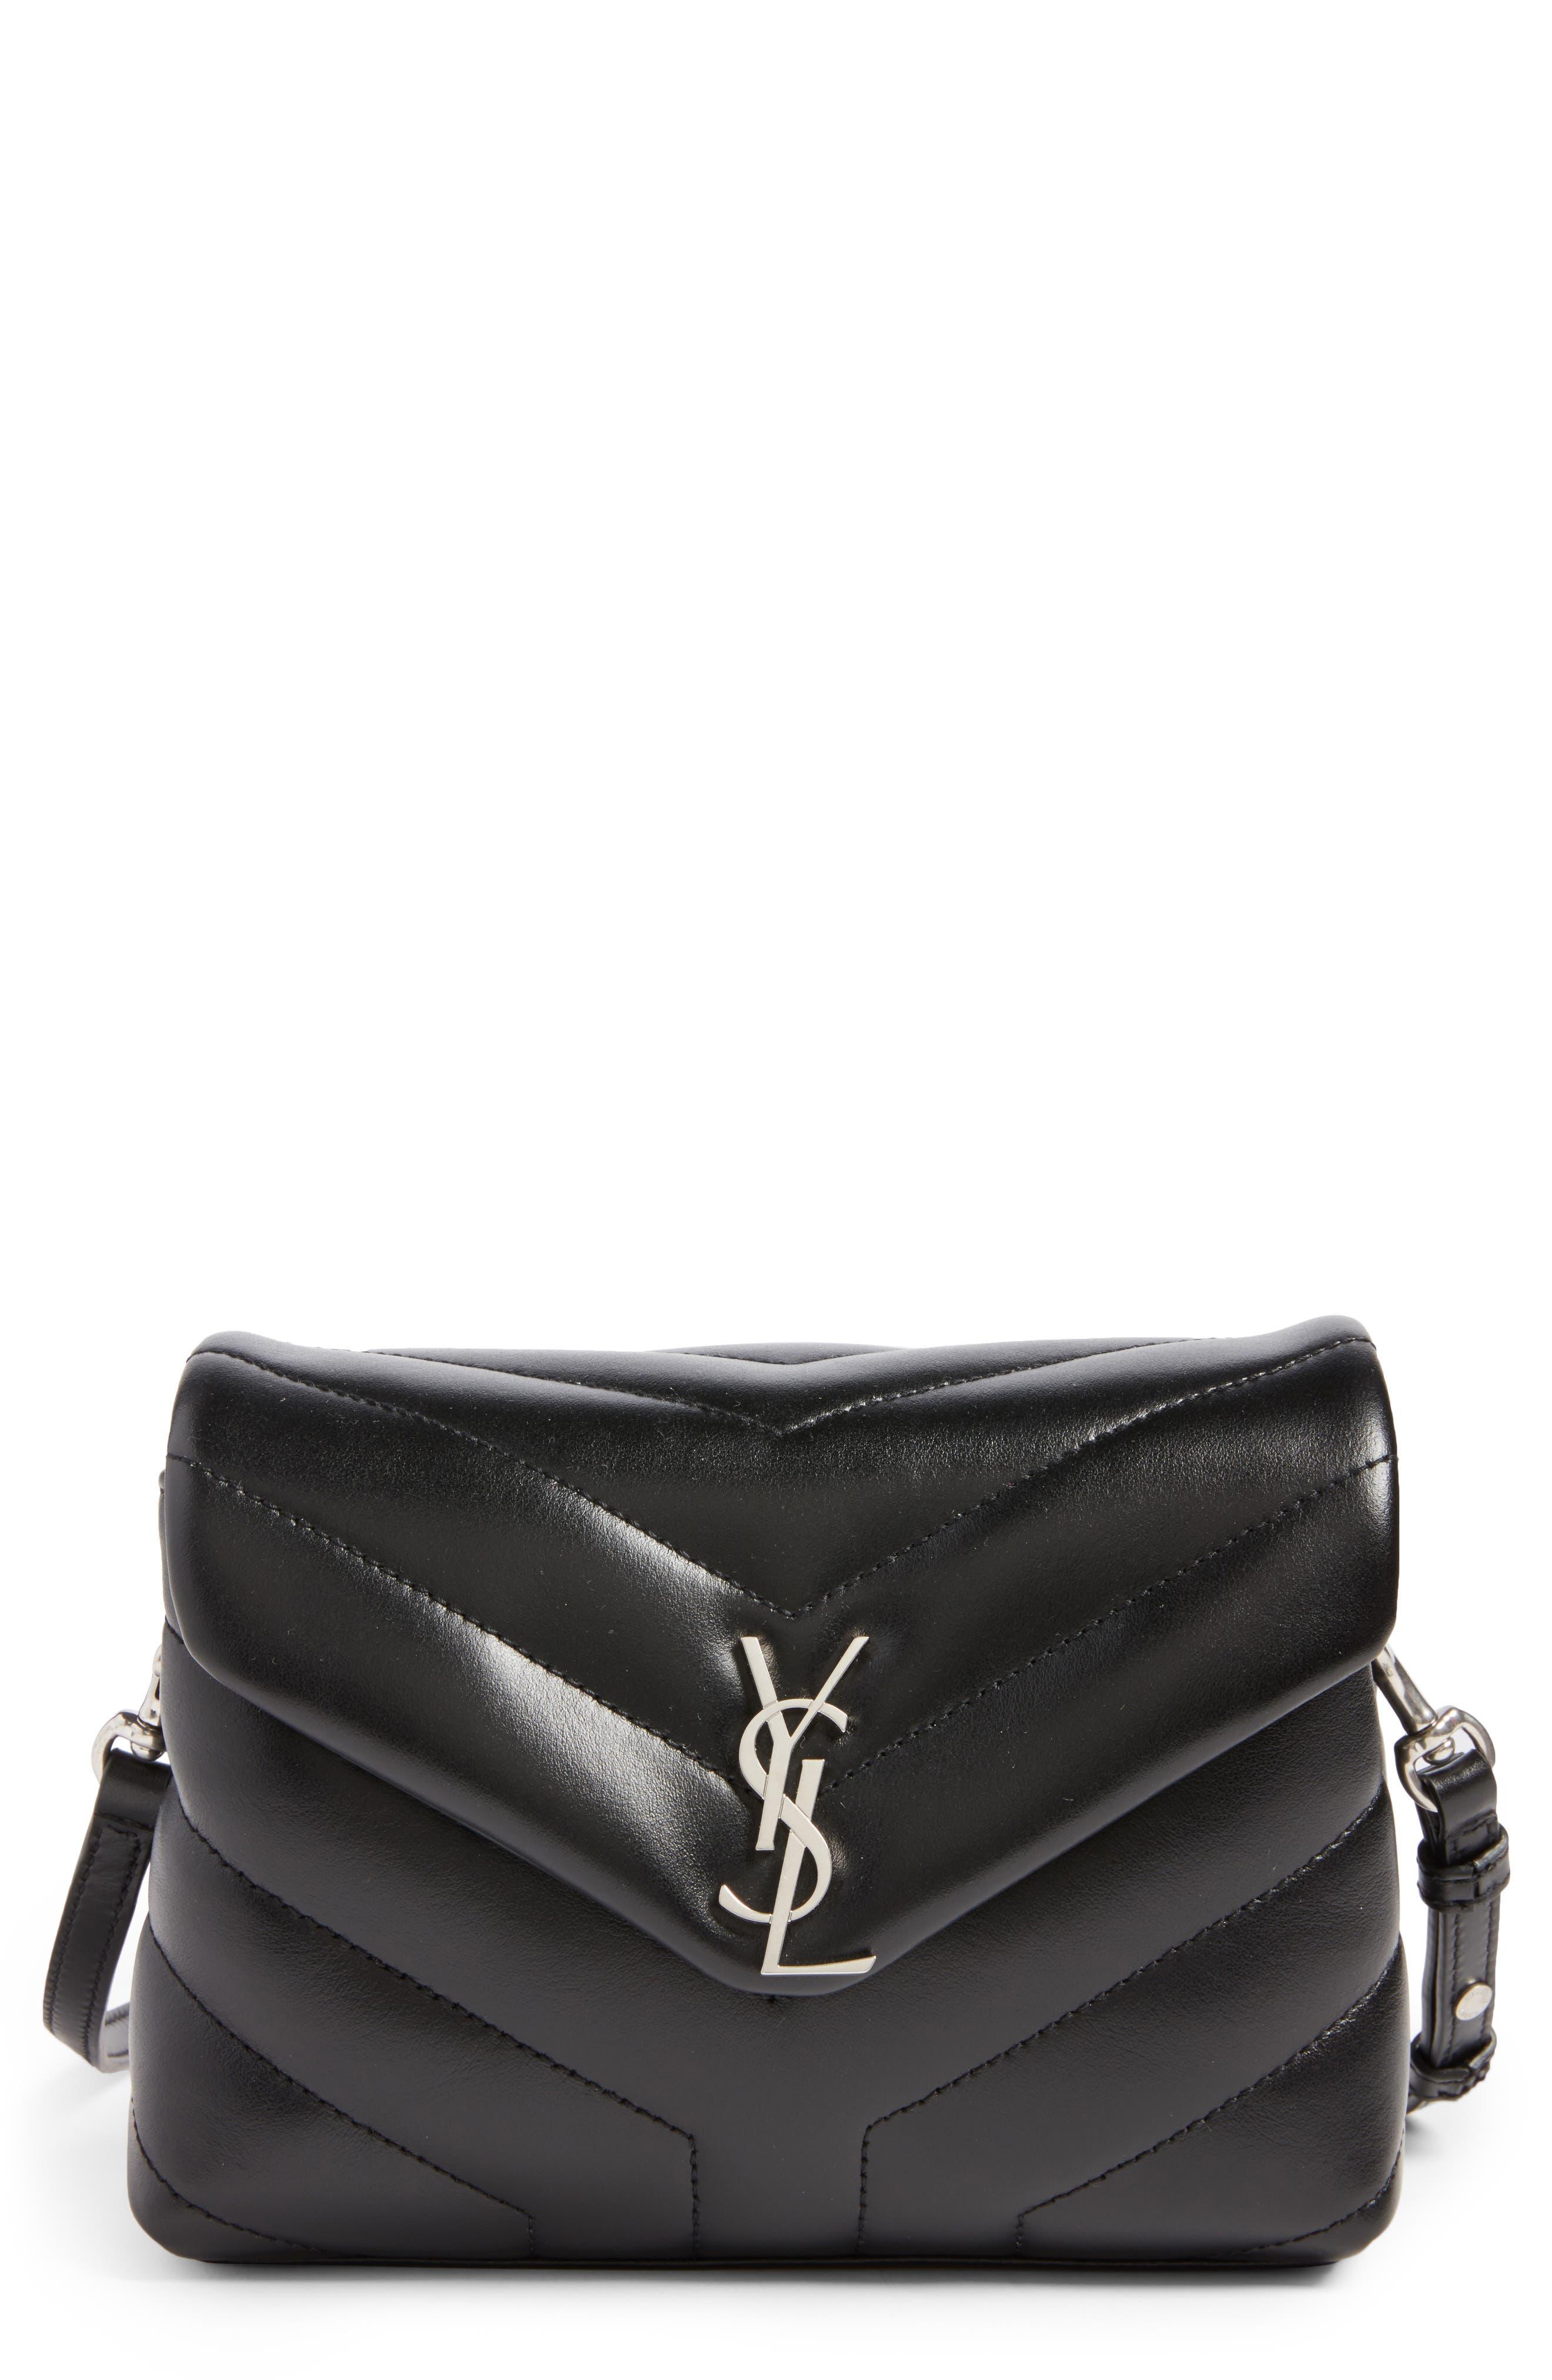 Main Image - Saint Laurent Toy LouLou Calfskin Leather Crossbody Bag